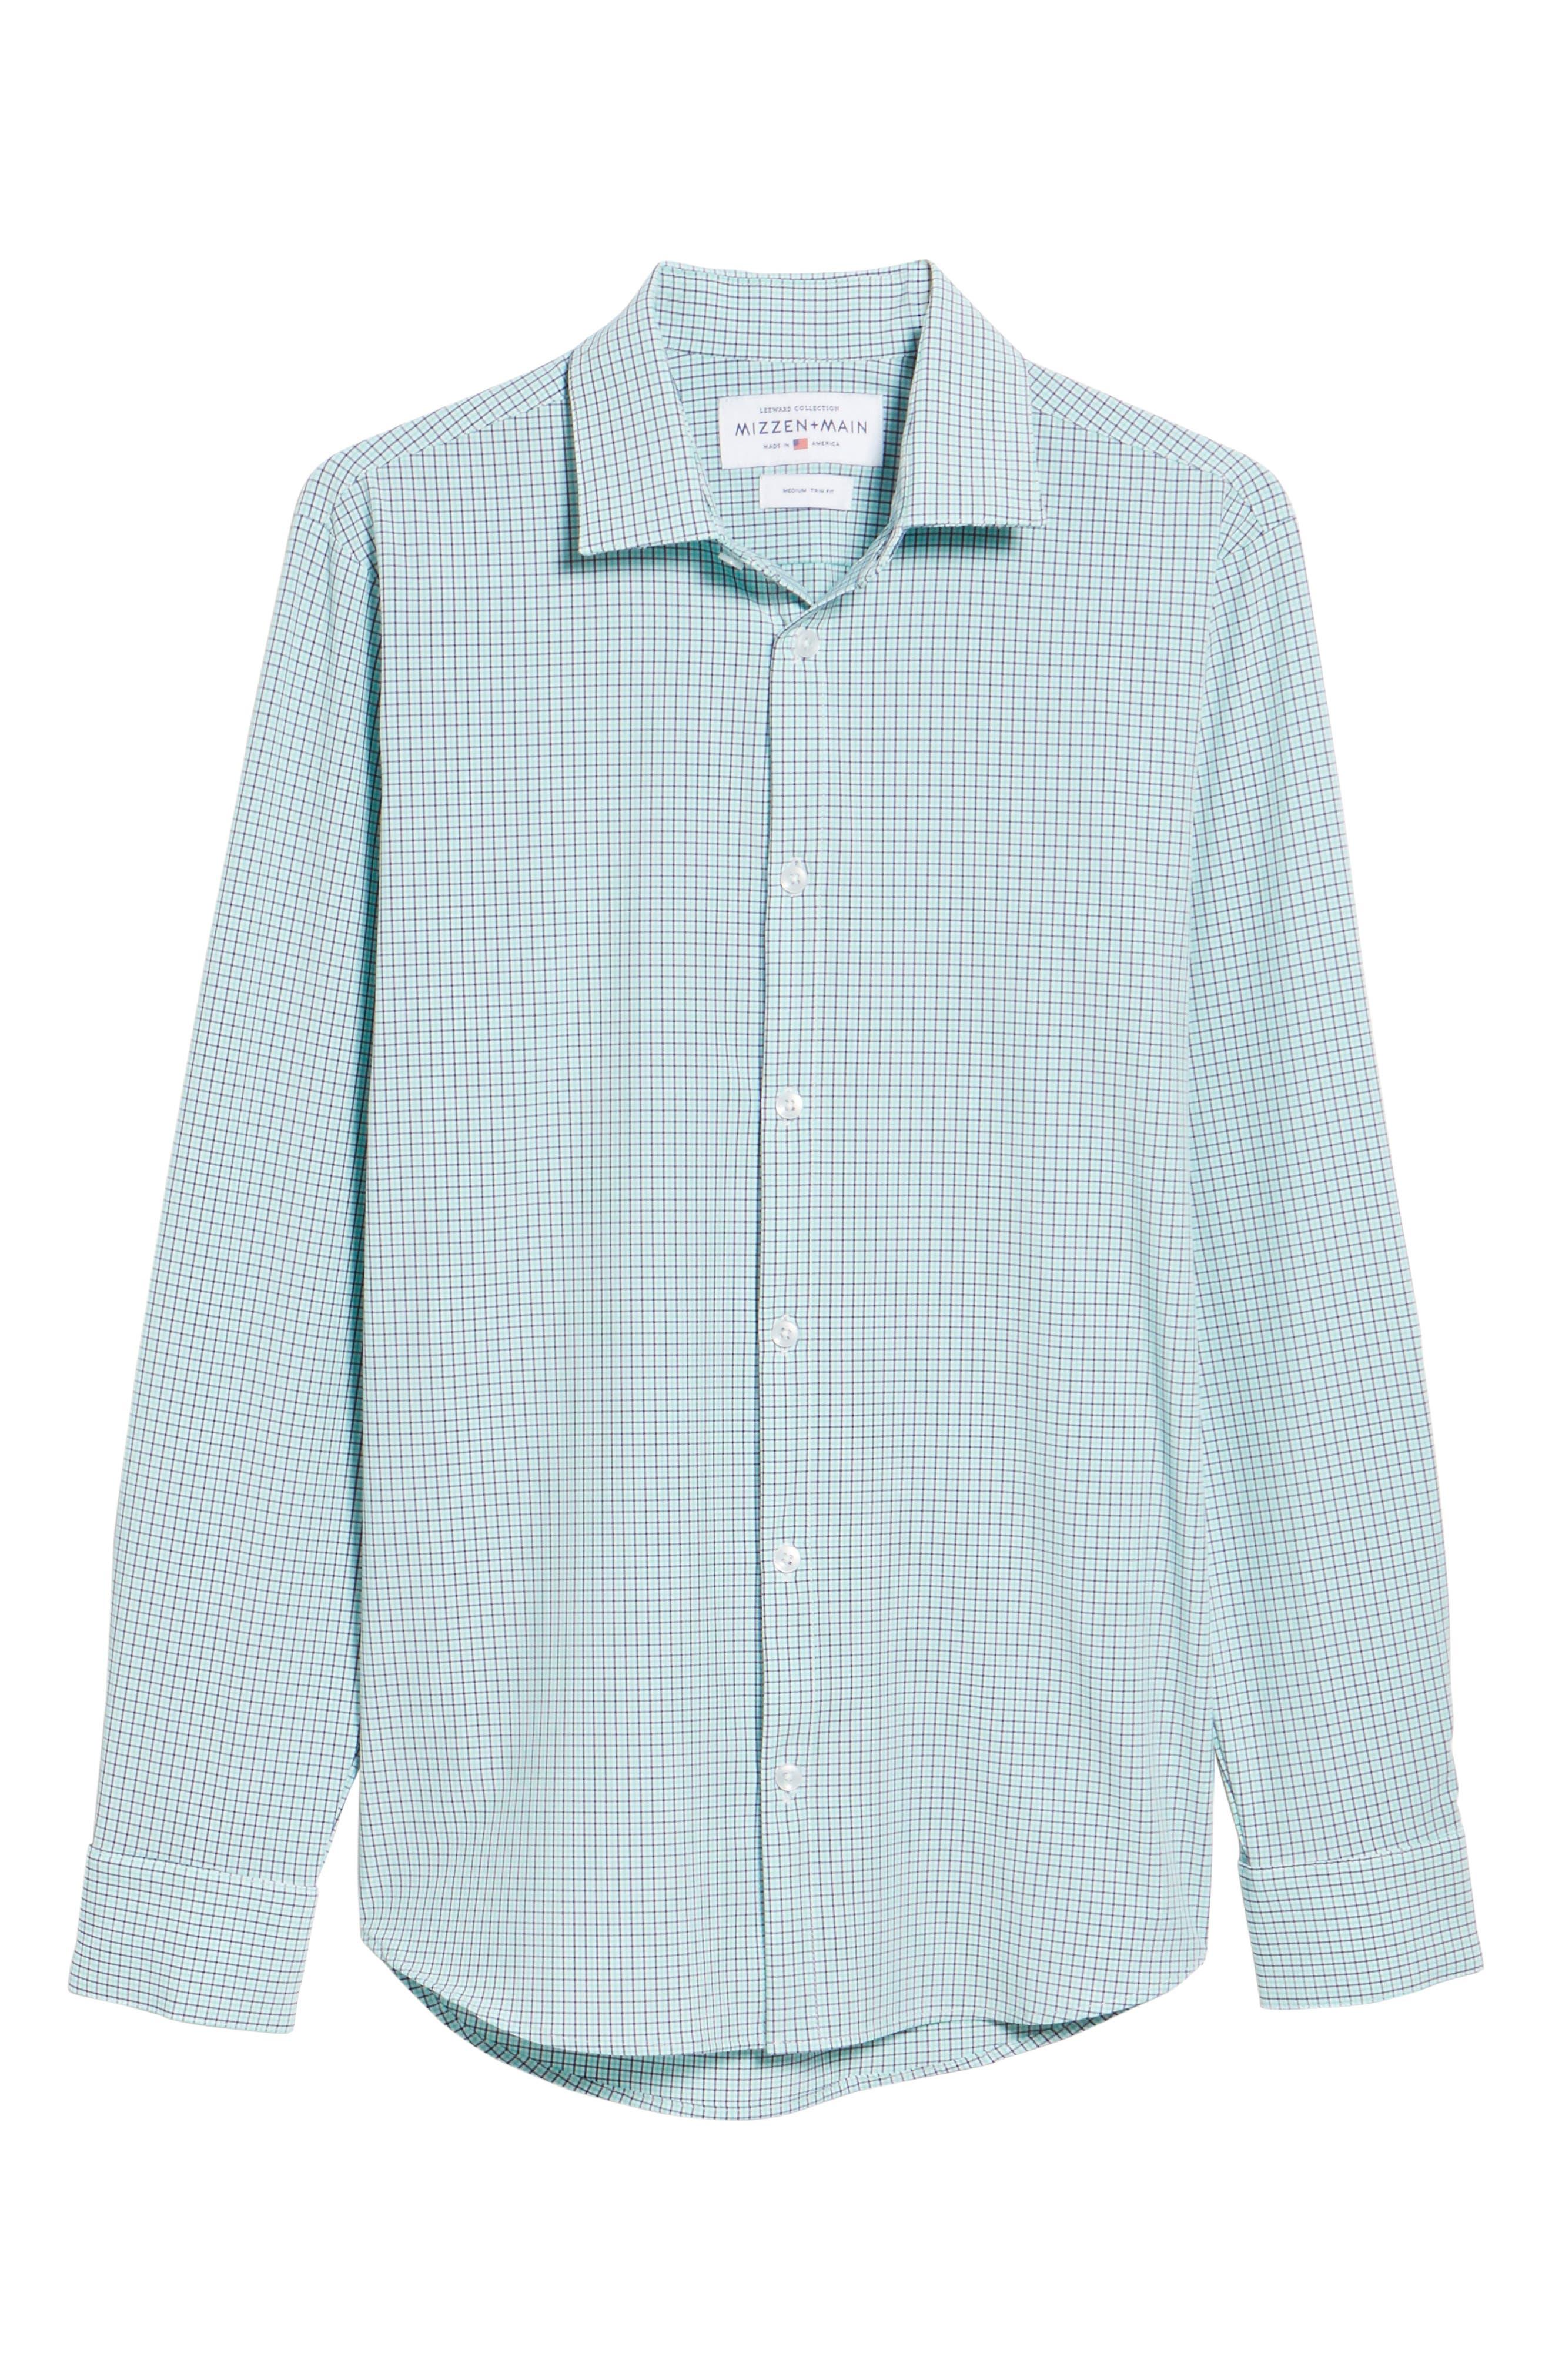 Ventura Check Sport Shirt,                             Alternate thumbnail 6, color,                             377